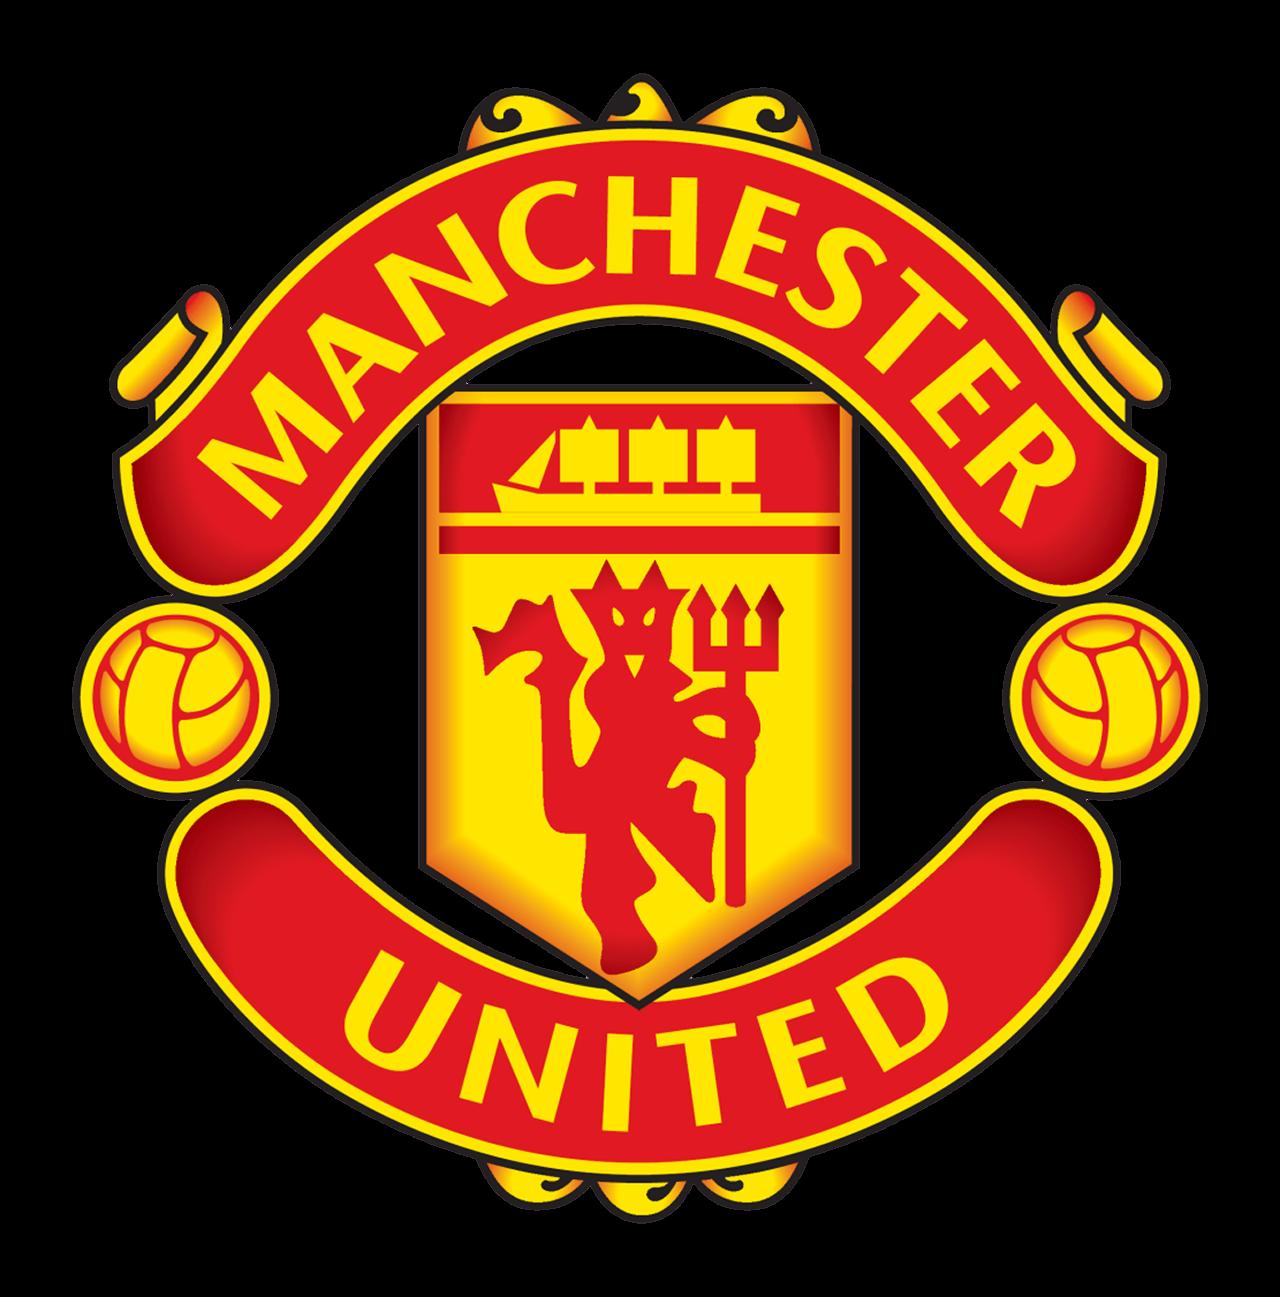 City clipart pixel. Manchester united logo transparent